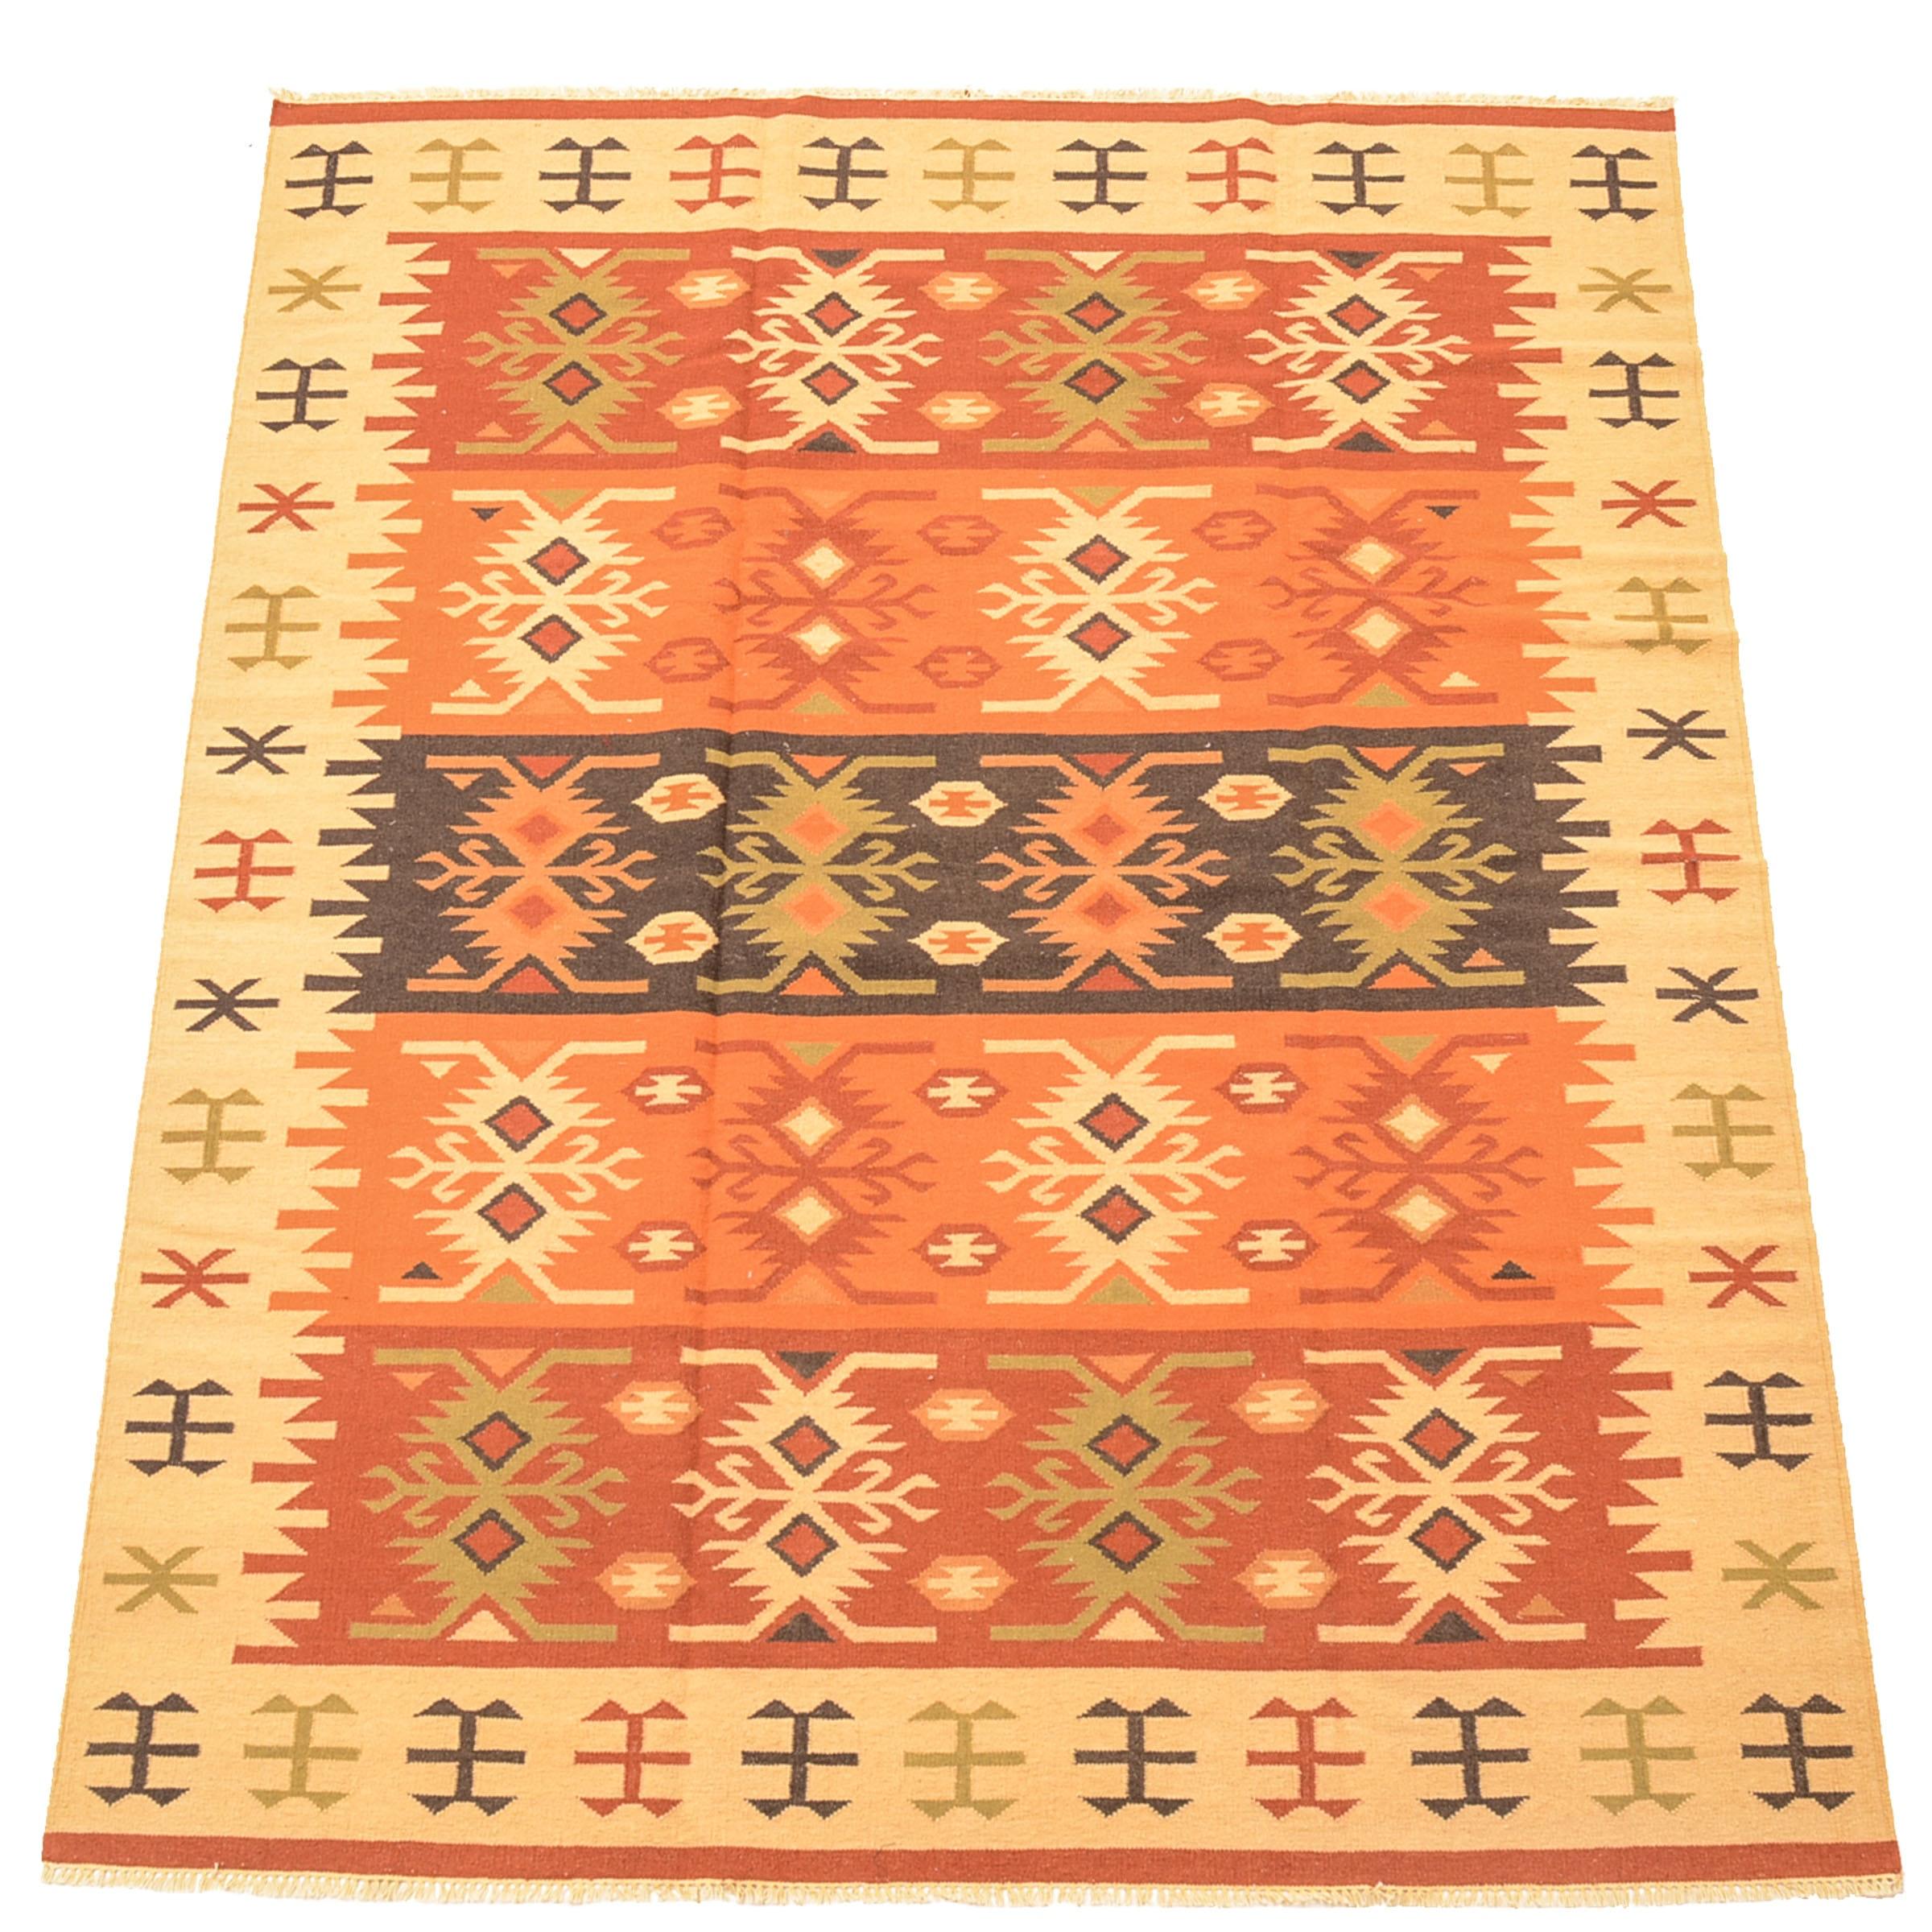 Hand-Woven Azerbaijan Kilim Room-Size Rug